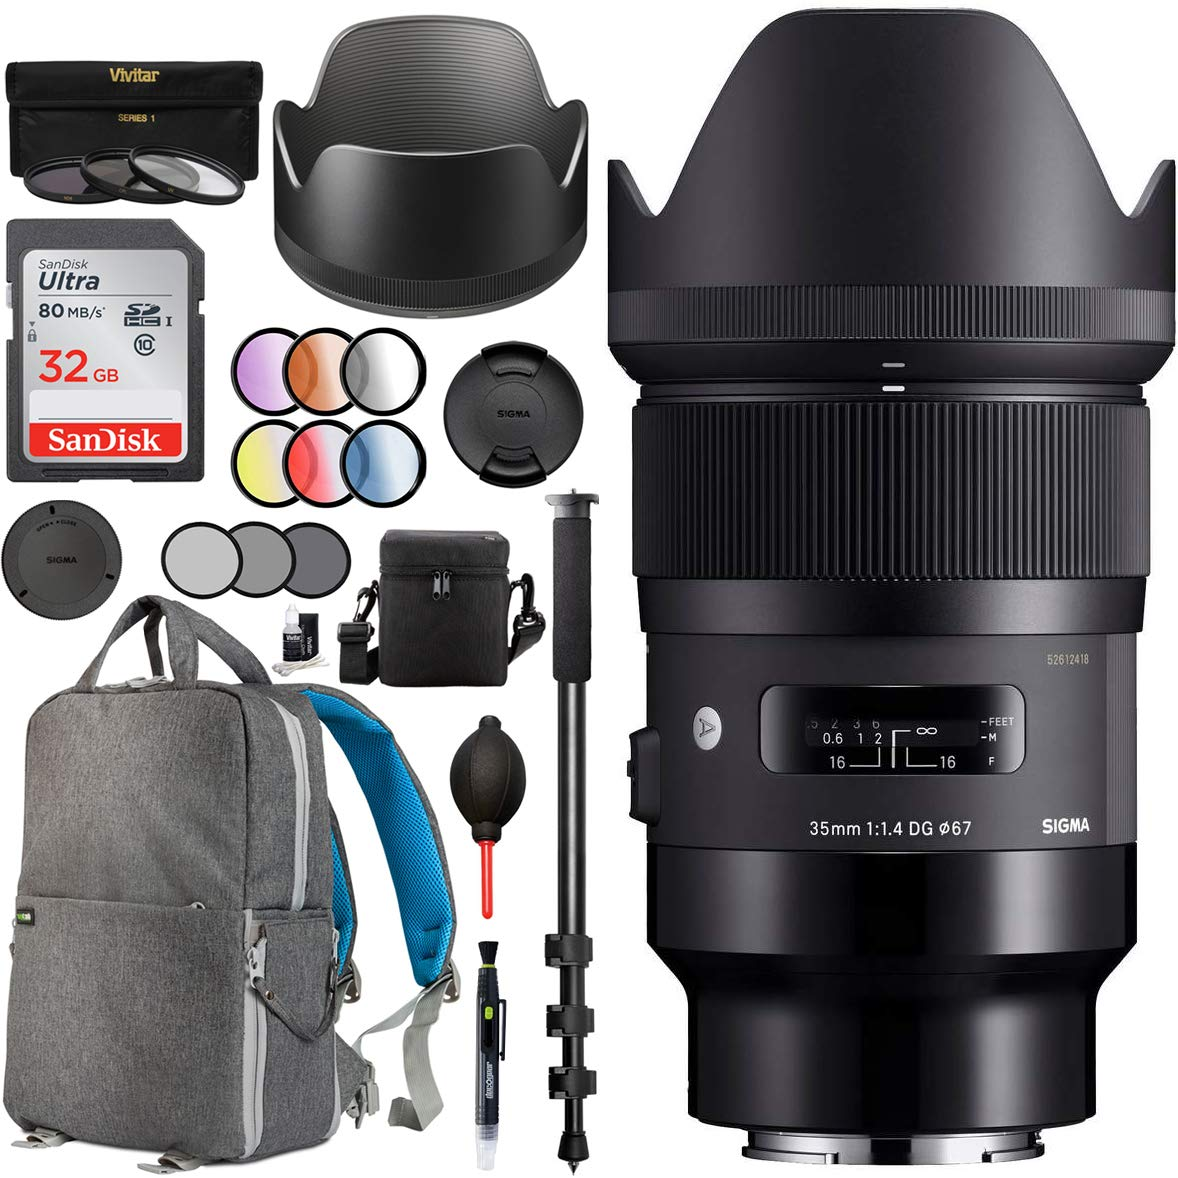 58mm CPL UV FLD filter kit for Olympus E-510 E-410 USA